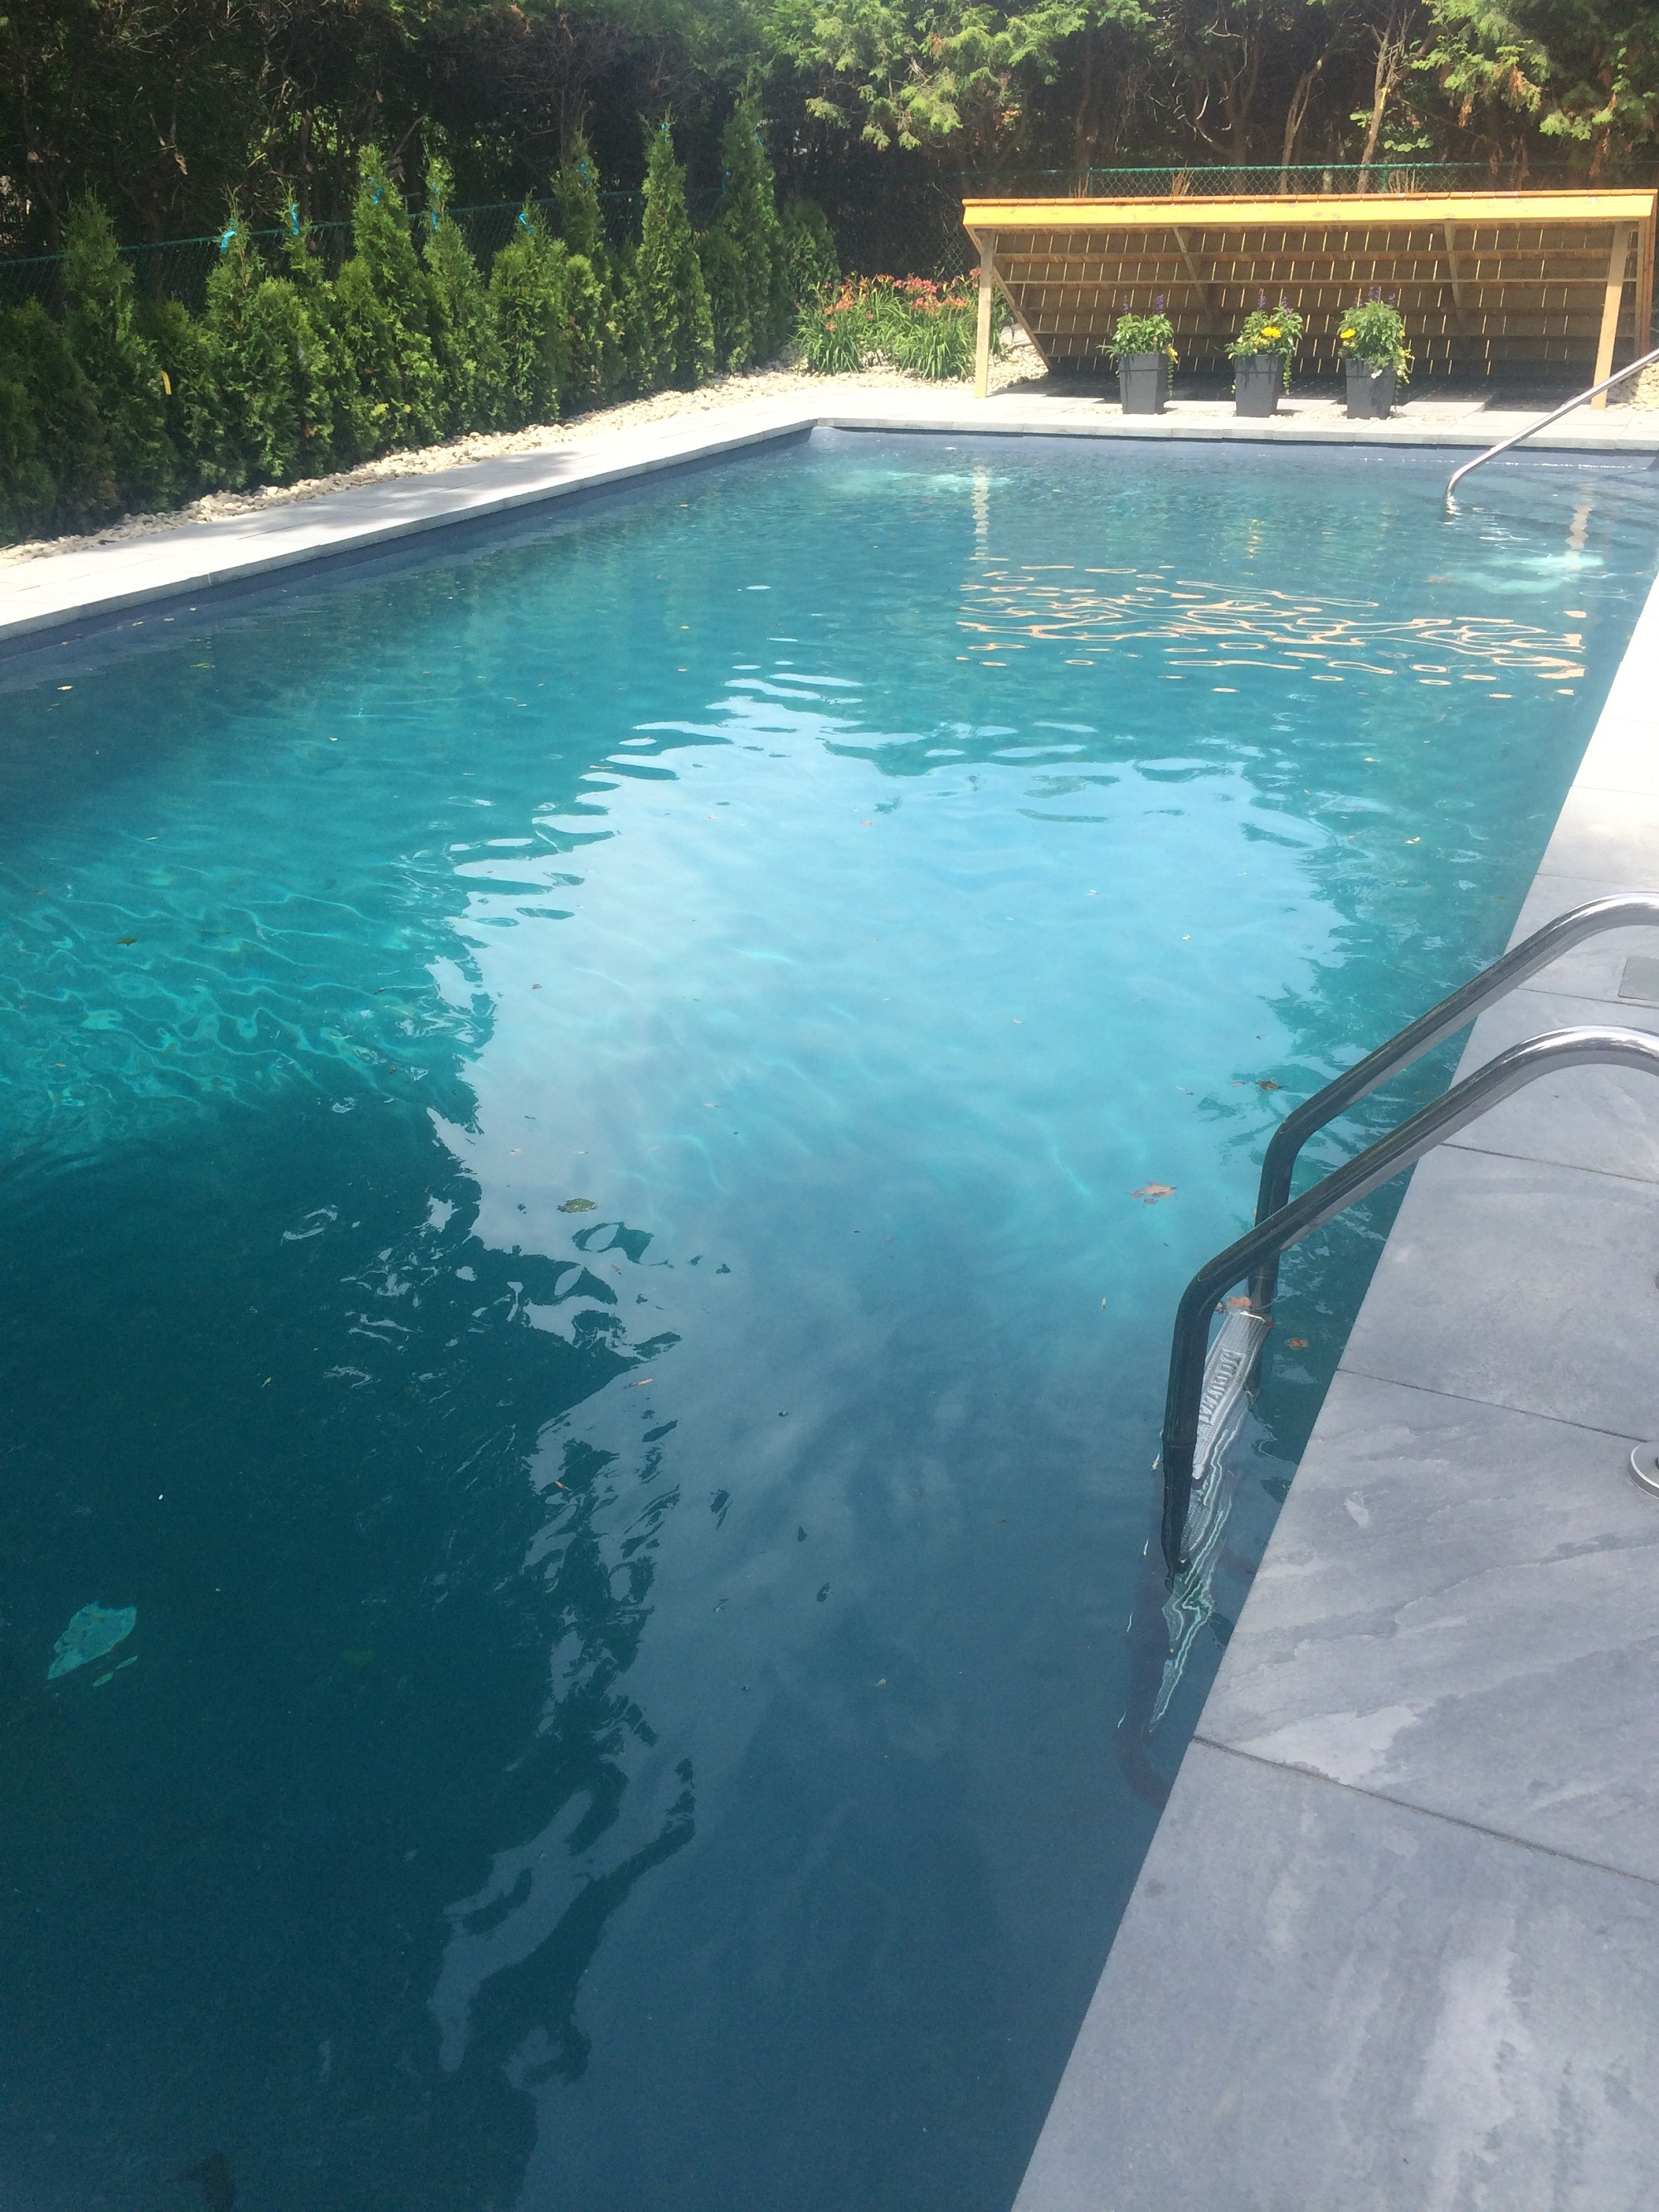 poseidon rectangle pool again.jpg